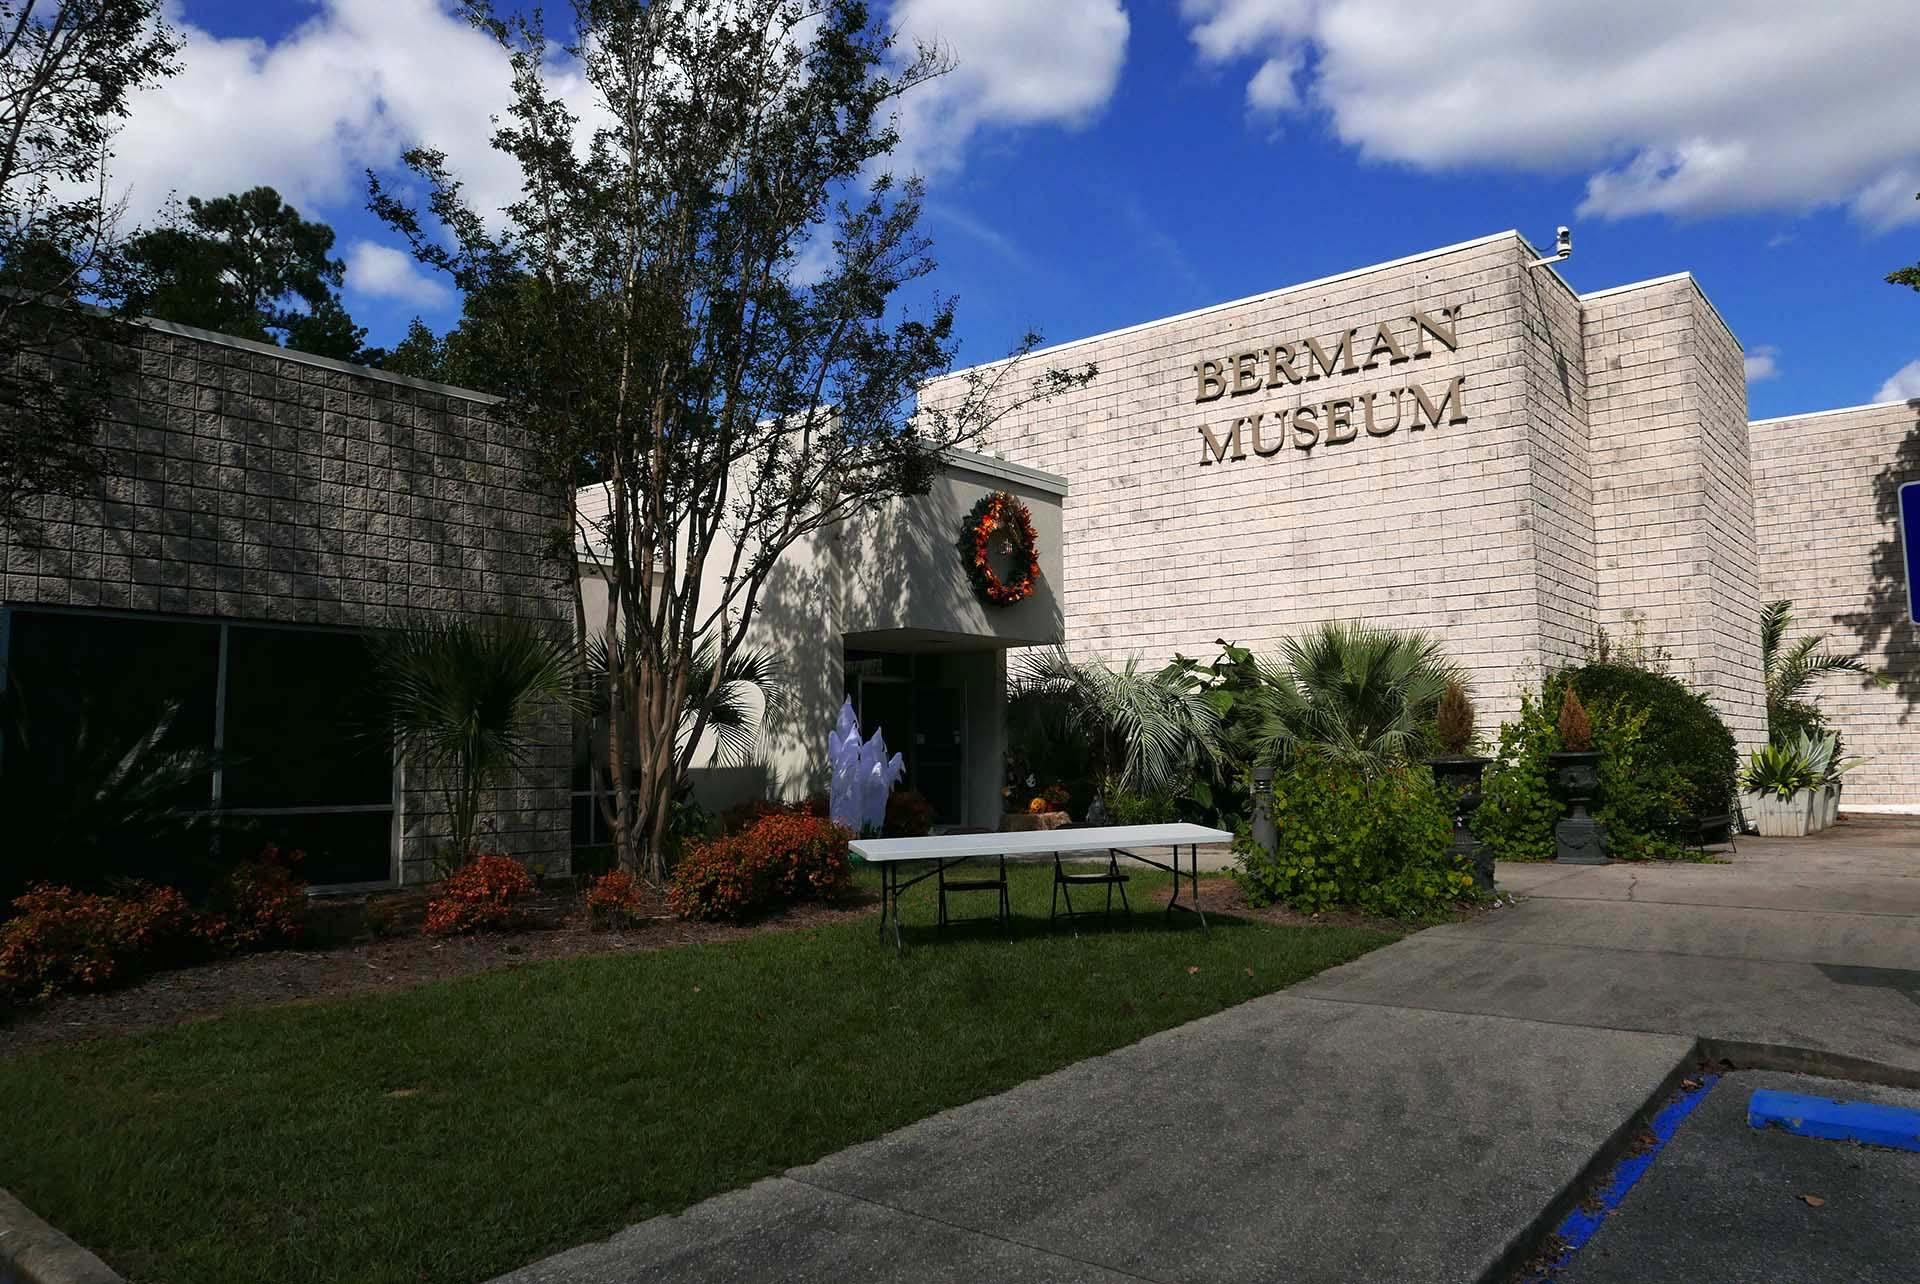 Berman Museum Anniston Civil Rights Trail